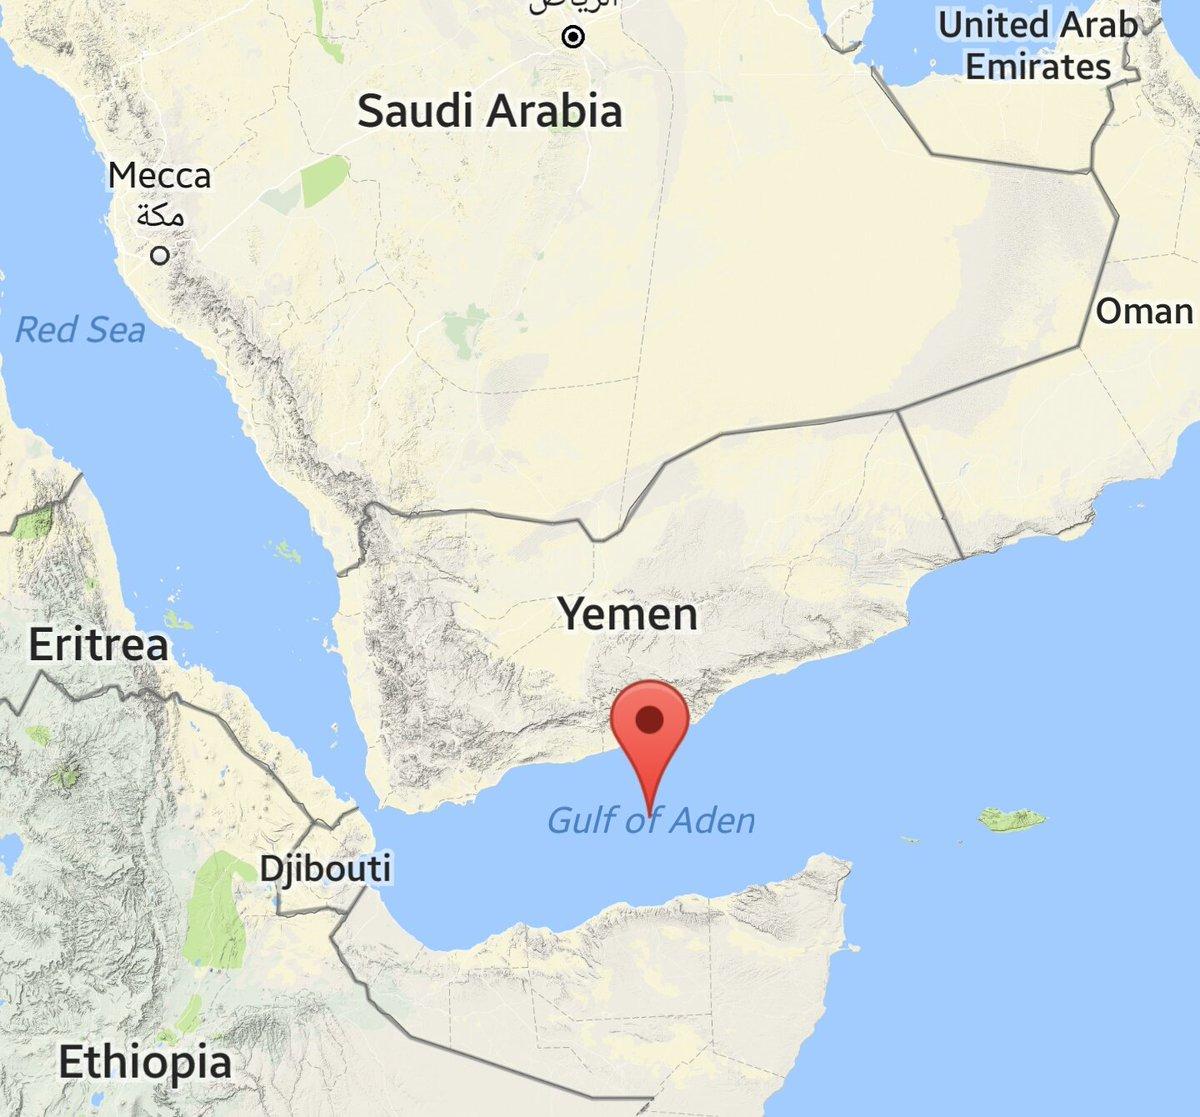 EKTAKTO: Ιράν-ΗΠΑ σε τροχιά σύρραξης – Μεταστάθμευσαν Αμερικανικά F-16CM για βομβαρδισμούς- Aναπτύχθηκε Ιρανικός στόλος απέναντι από τον αμερικανικό στην Υεμένη (εικόνες) - Εικόνα2